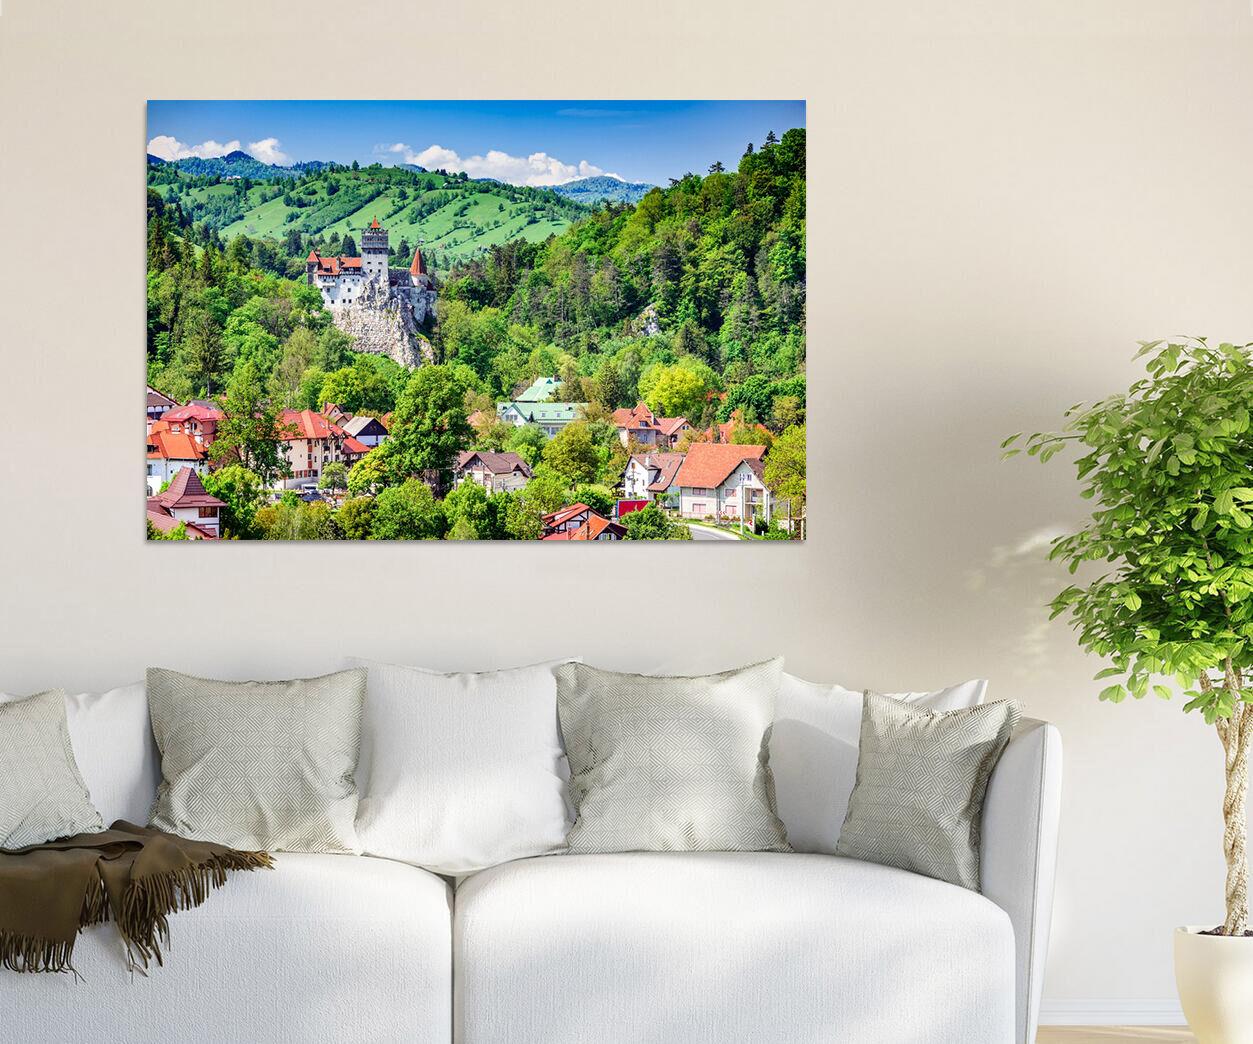 3D Bäume Dorf 563 Fototapeten Wandbild BildTapete AJSTORE DE Lemon